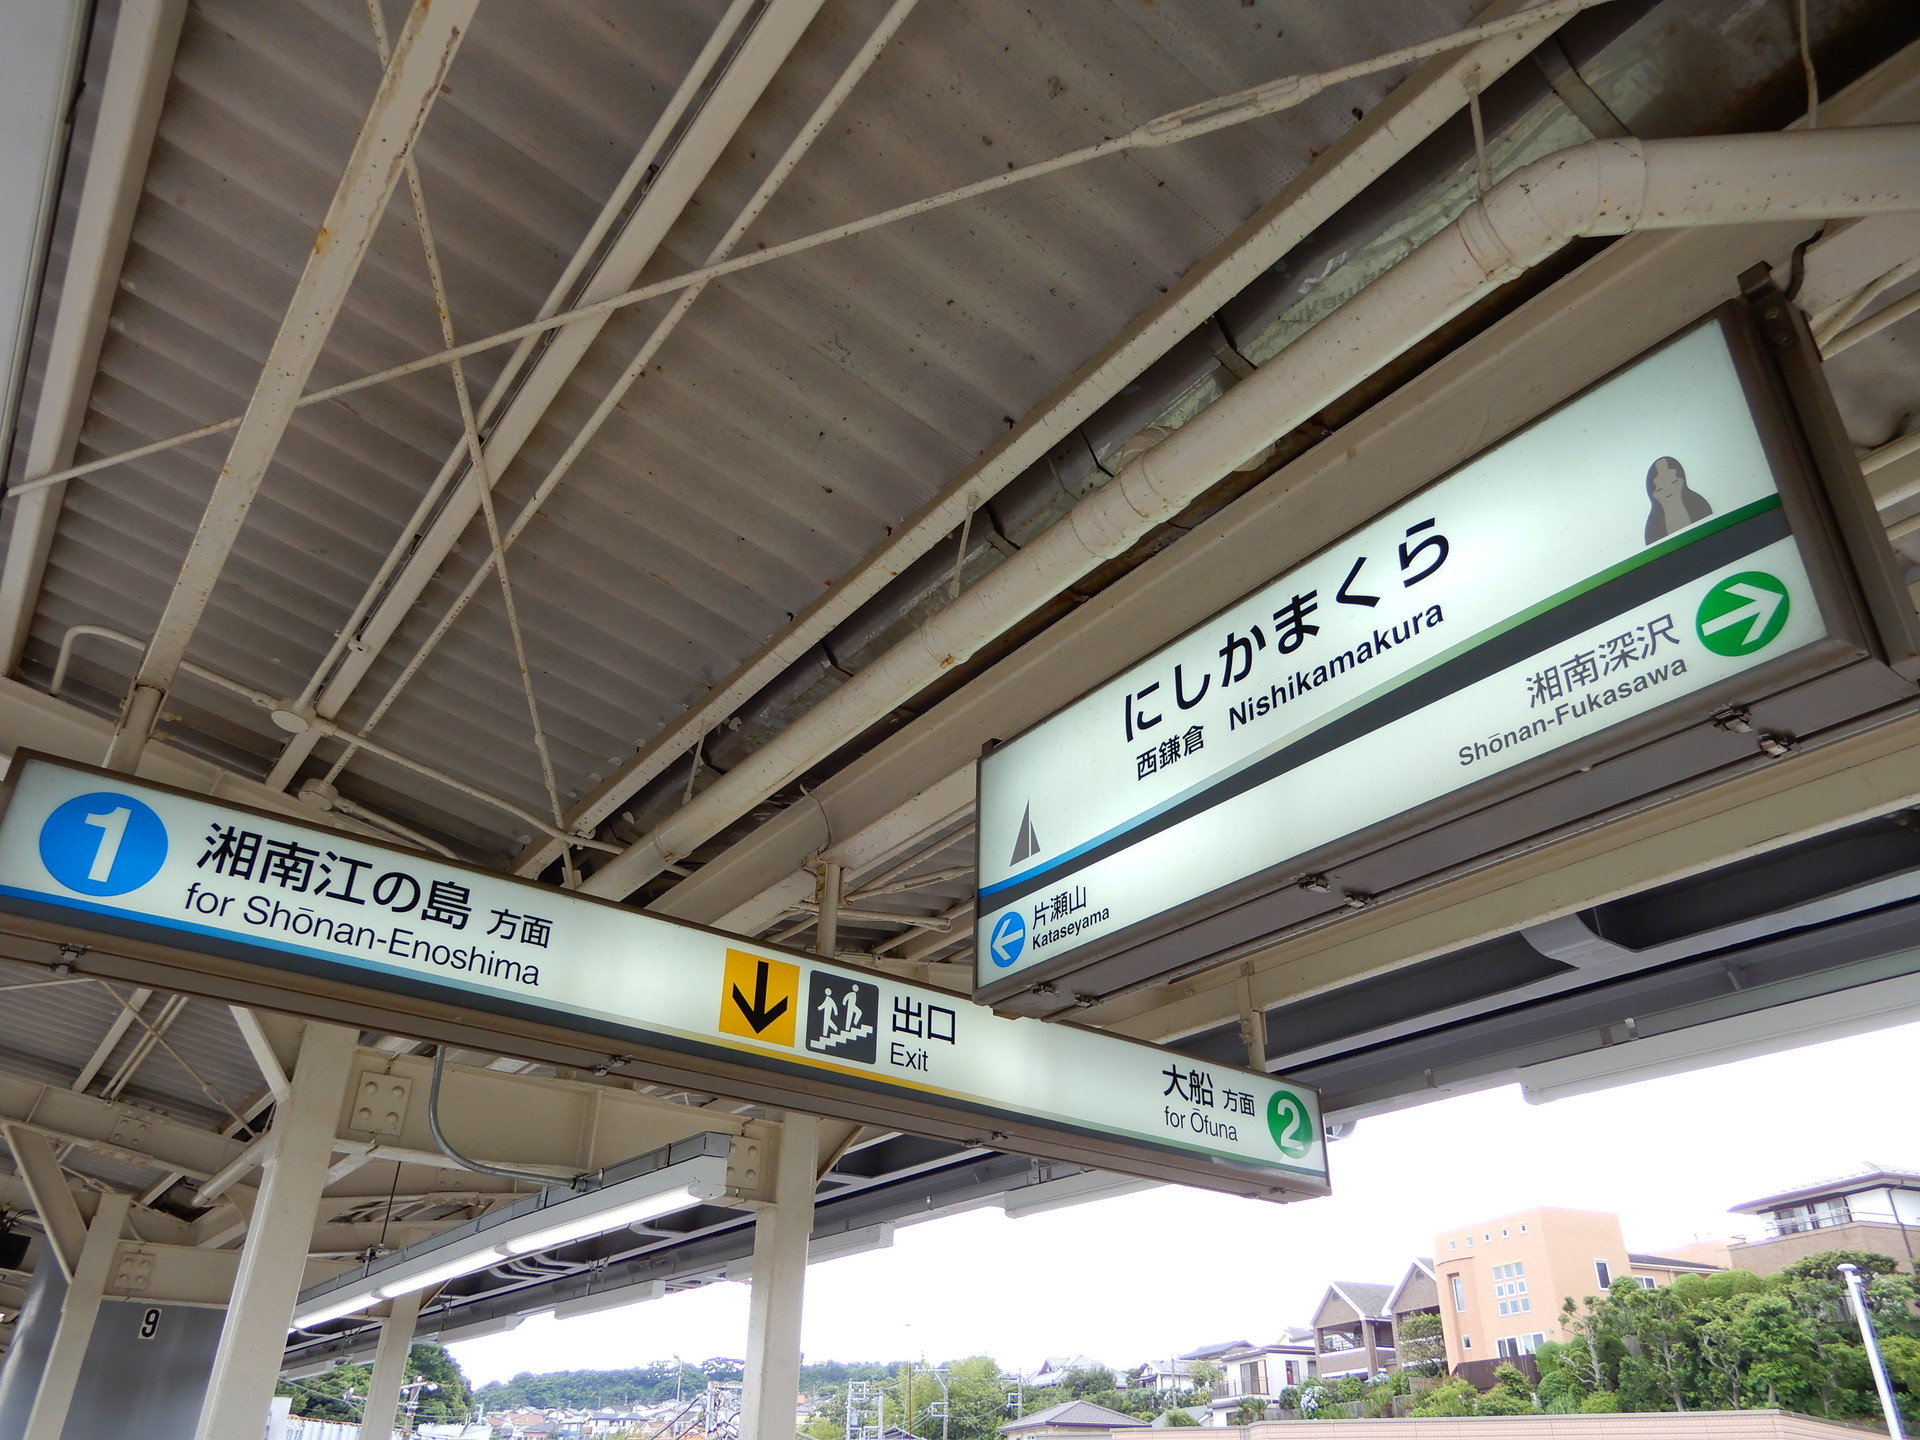 西鎌倉駅の番線表示